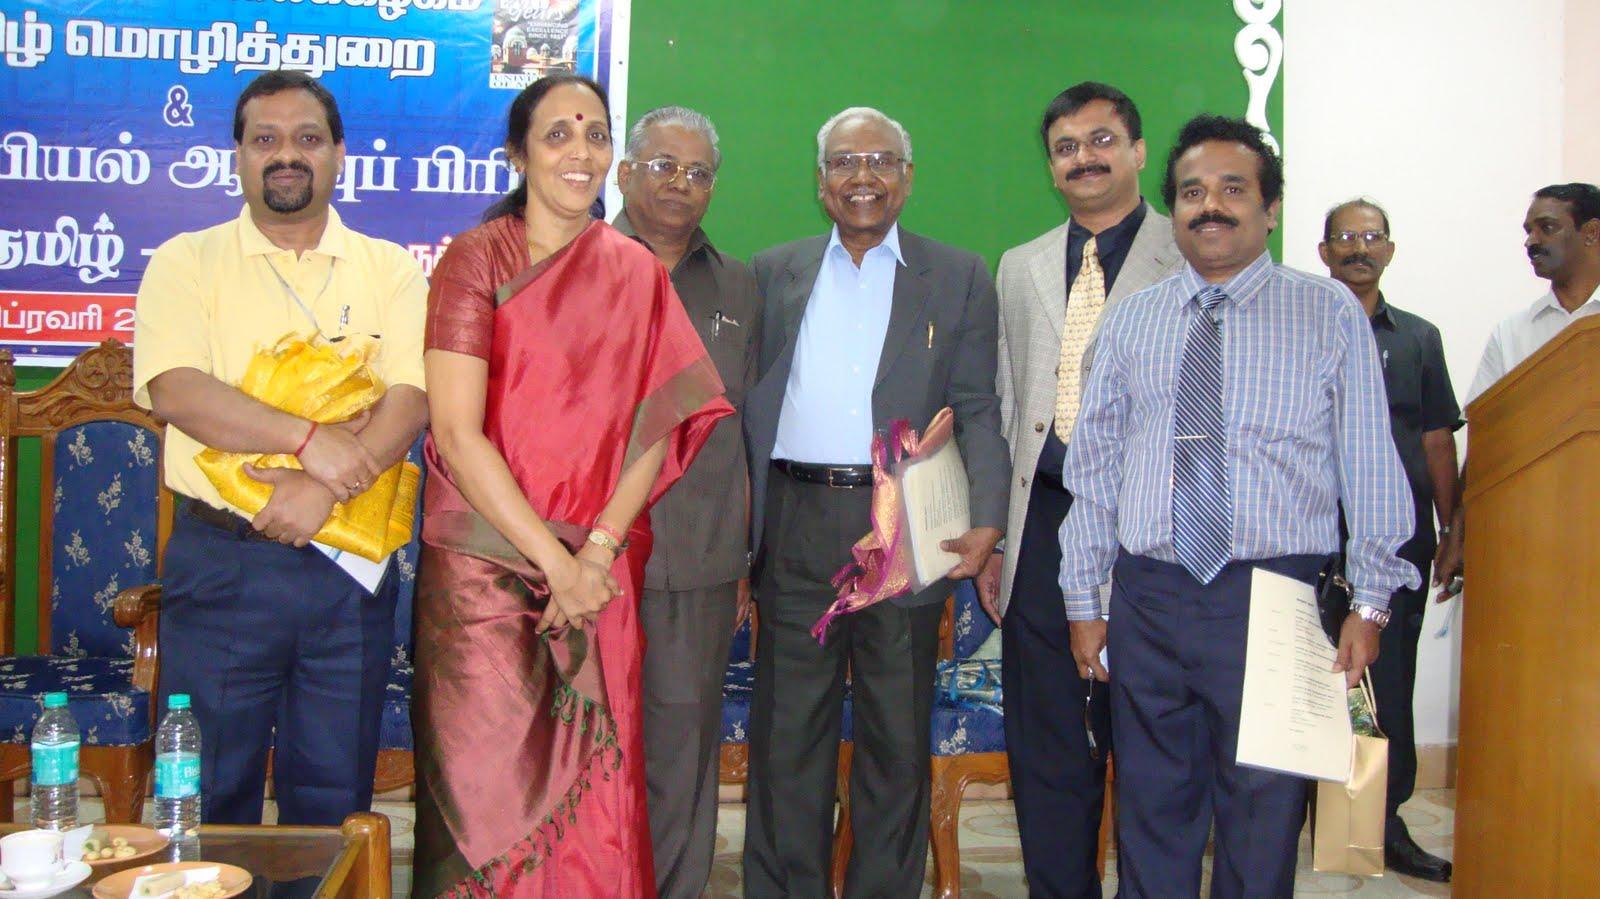 Dr. Niladri Sekhar Dash (Indian Statistical Institute),Dr.Poongothai Aladi Aruna (Minister for Information Technology, Tamilnadu Government), Prof. N. Deivasundaram (Head of the Department of Tamil Language, University of Madras), Prof.M.Anandakrishnan (Chairman, IIT Kanpur),T.N.C.Venkata Rangan (Chair, INFITT), Dr.A.R. Sivakumaran (Professor, Nanyang Technological University, Singapore)